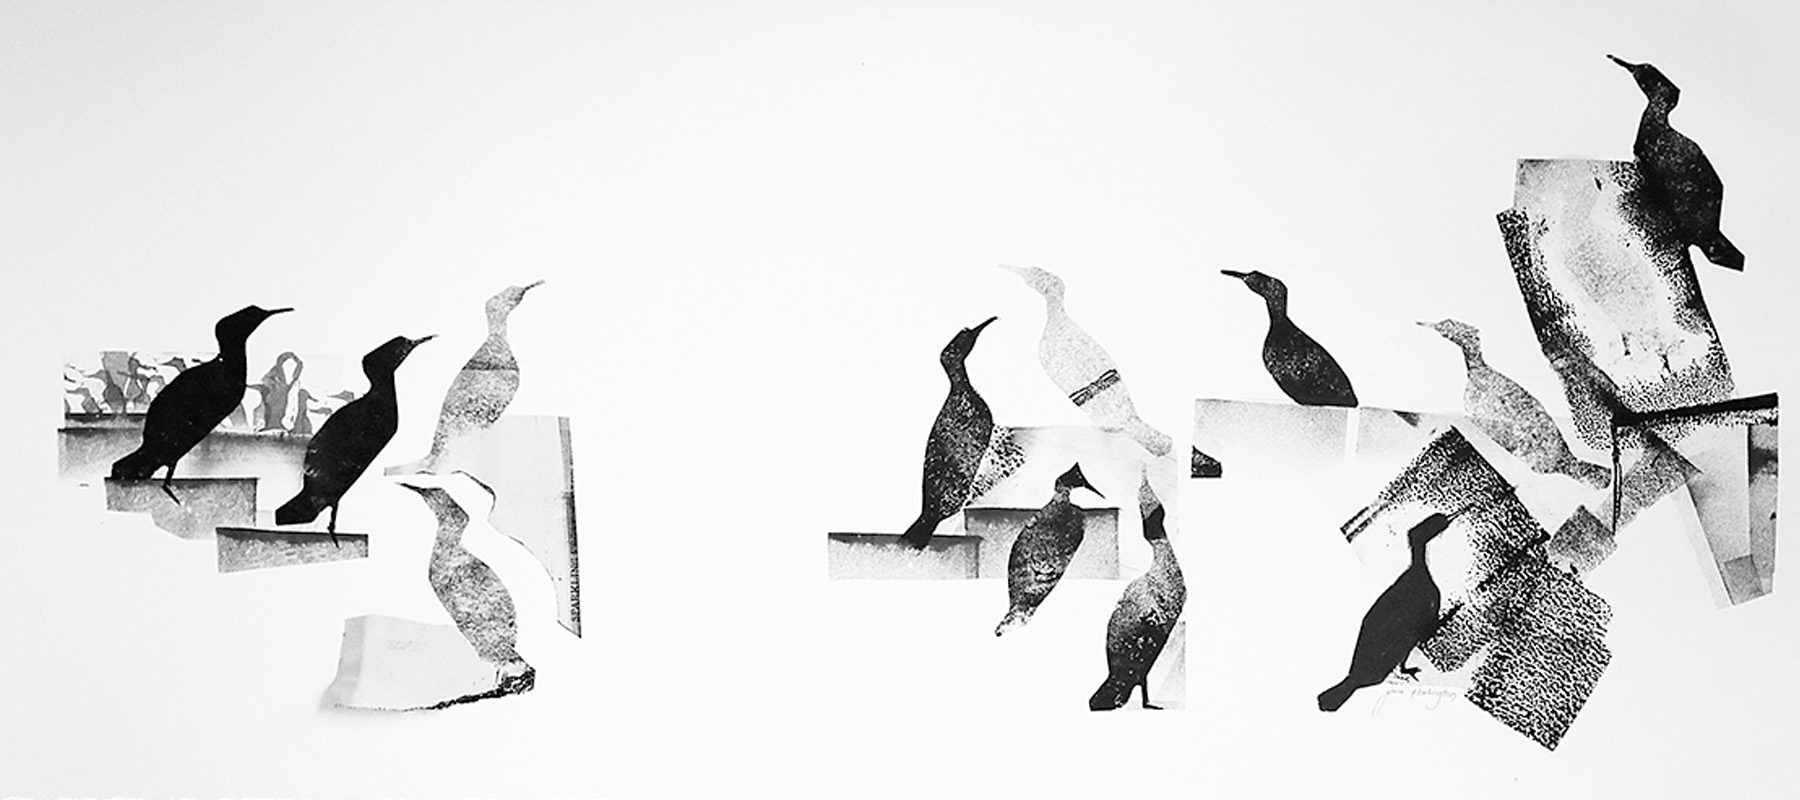 Cormorants by - Jane Harlington - artist - Blue Pig Studio - Carloway - Isle of Lewis